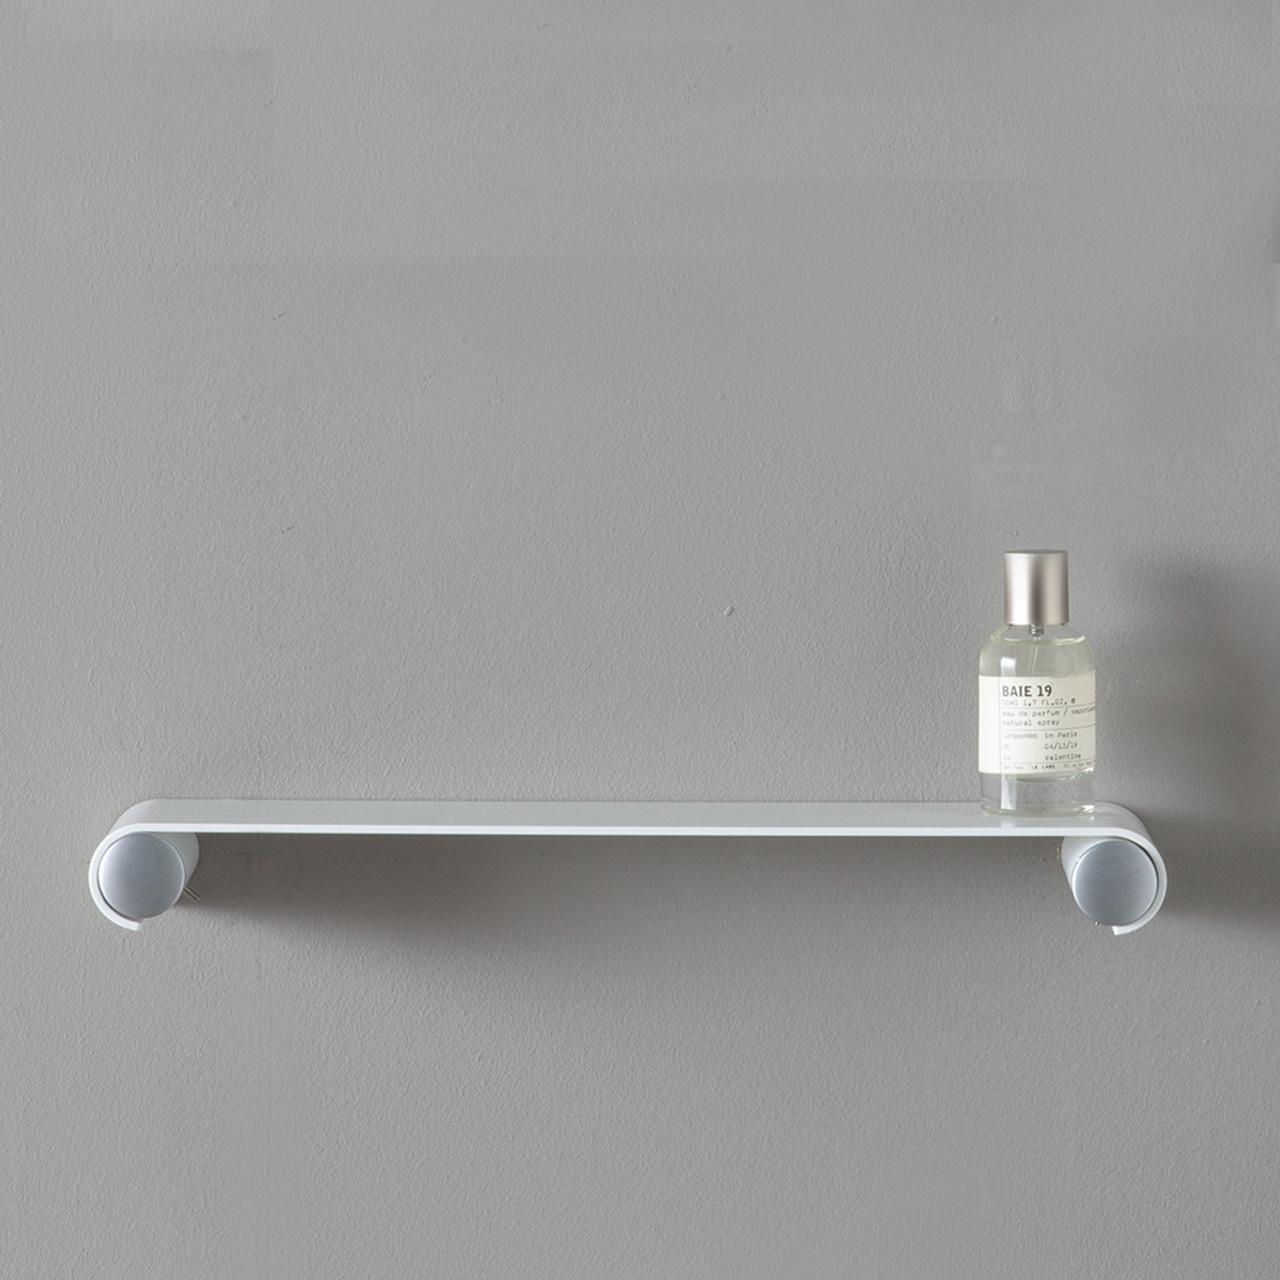 "White 10"" Floating Shower and Bathroom Shelf"